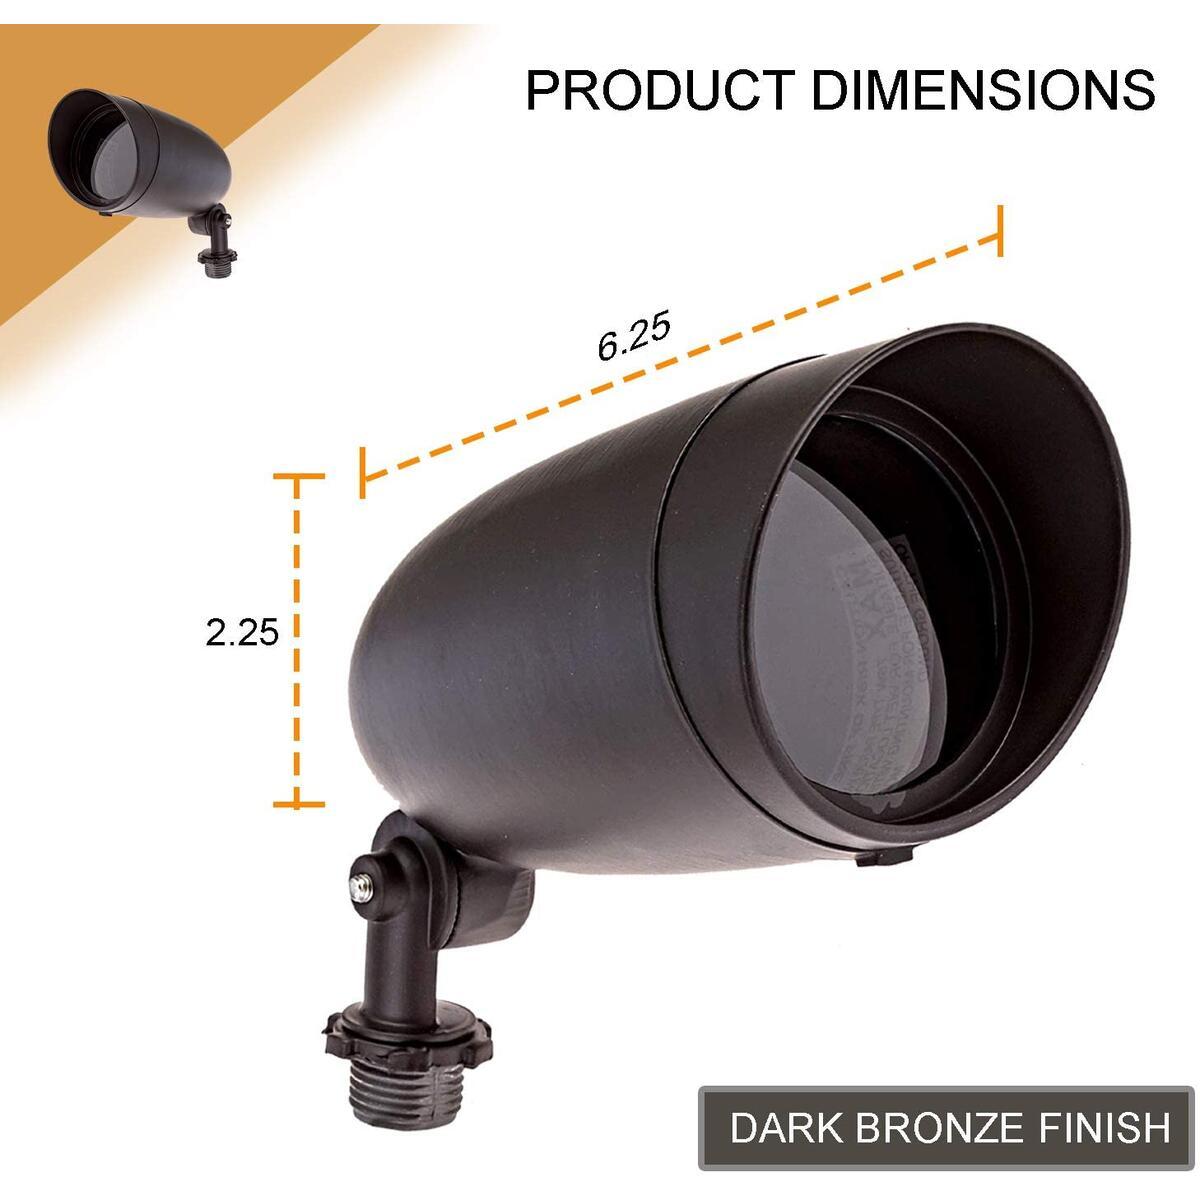 Dysmio Lighting One Light PAR20 120 Volt Die Cast Aluminum Durable Outdoor Landscape Security Lighting Flood, Dark Bronze